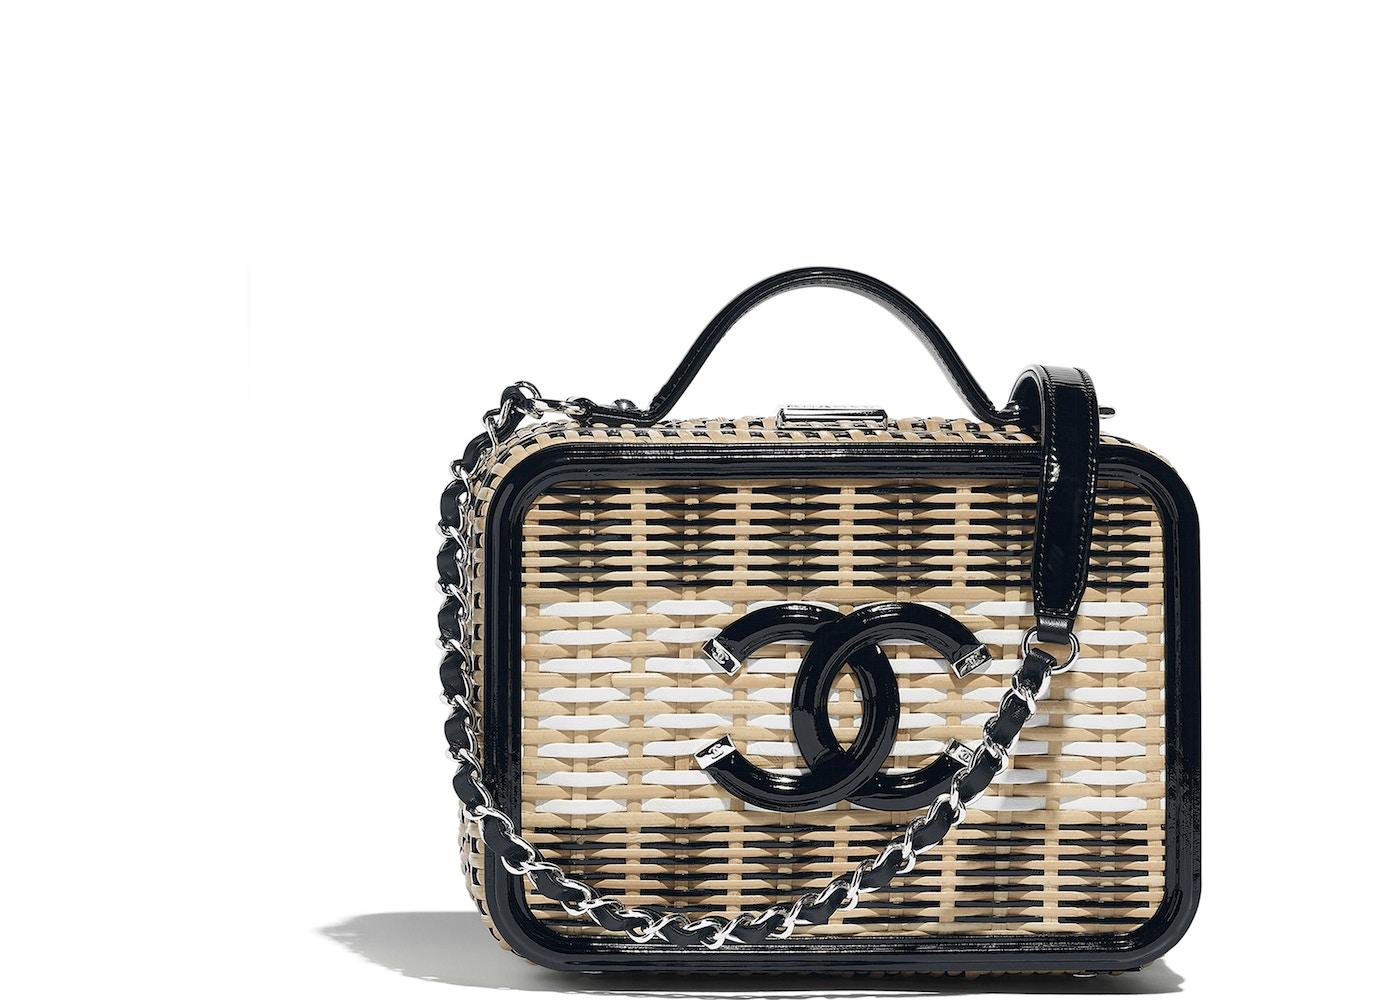 30e07ec5e85a Chanel Vanity Case Rattan Beige Black White. Rattan Beige Black White